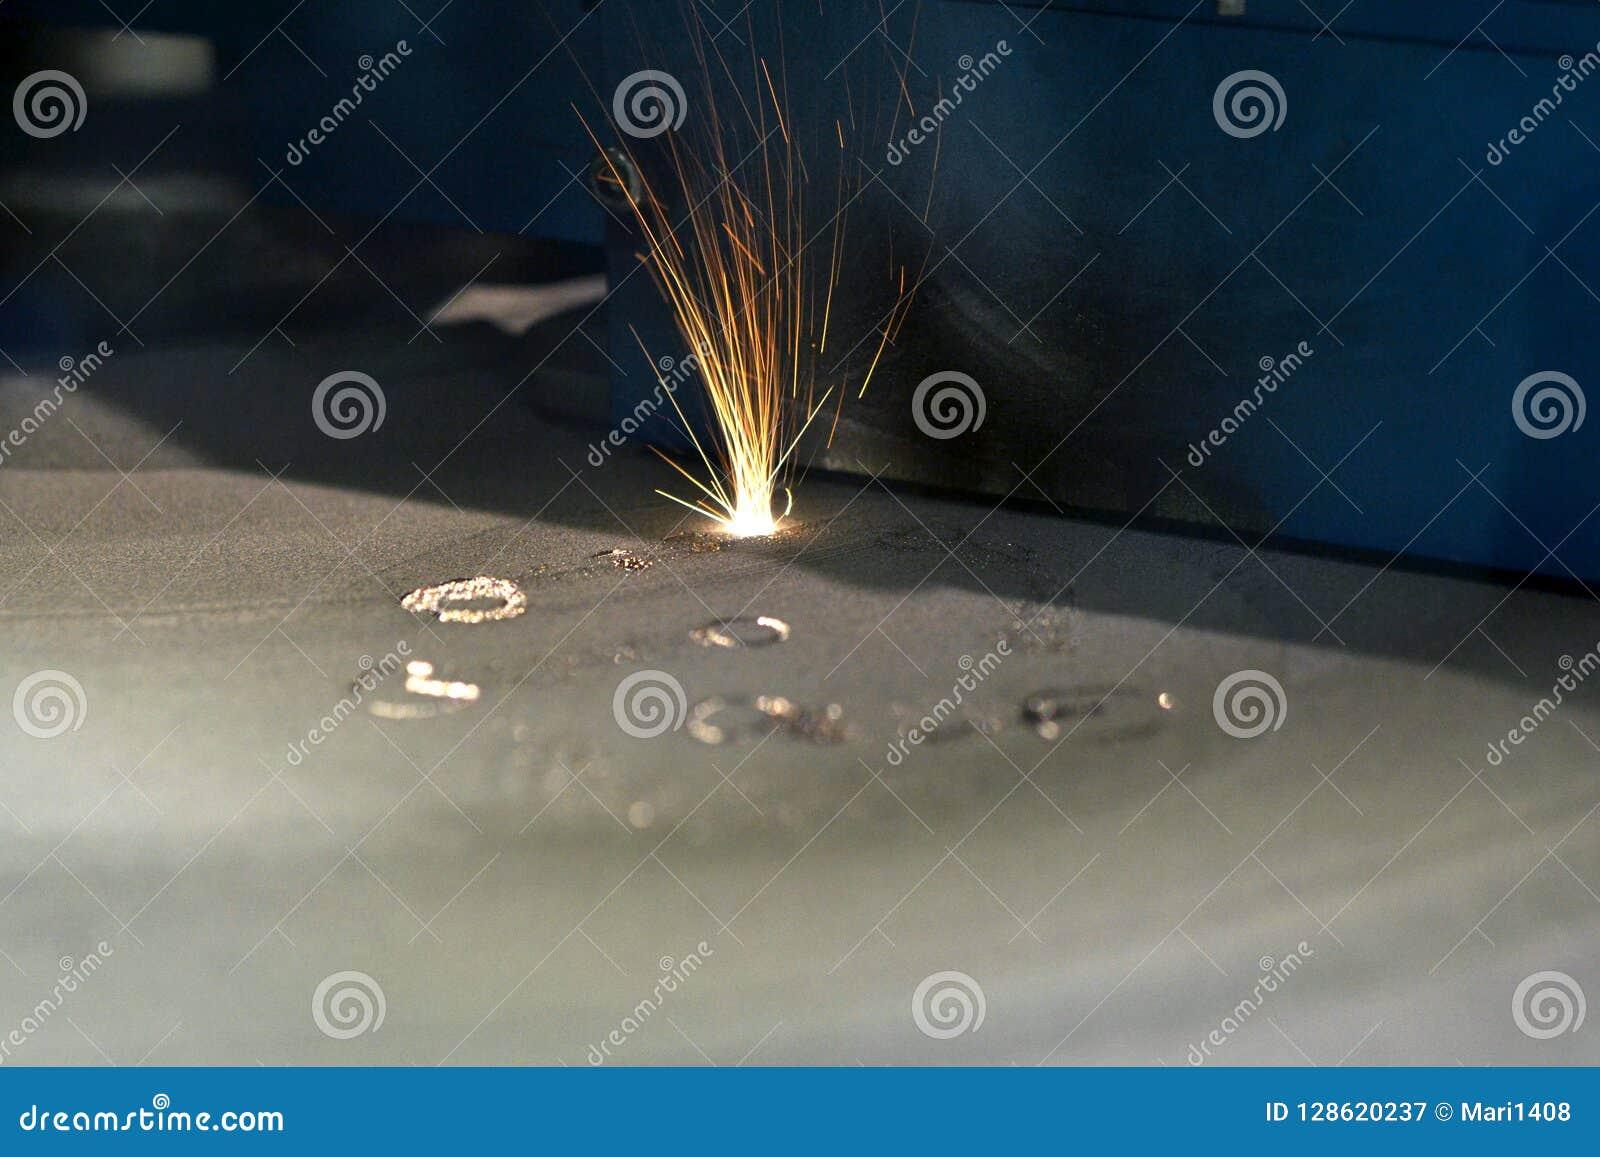 3D打印机打印金属 激光金属的焊接机器